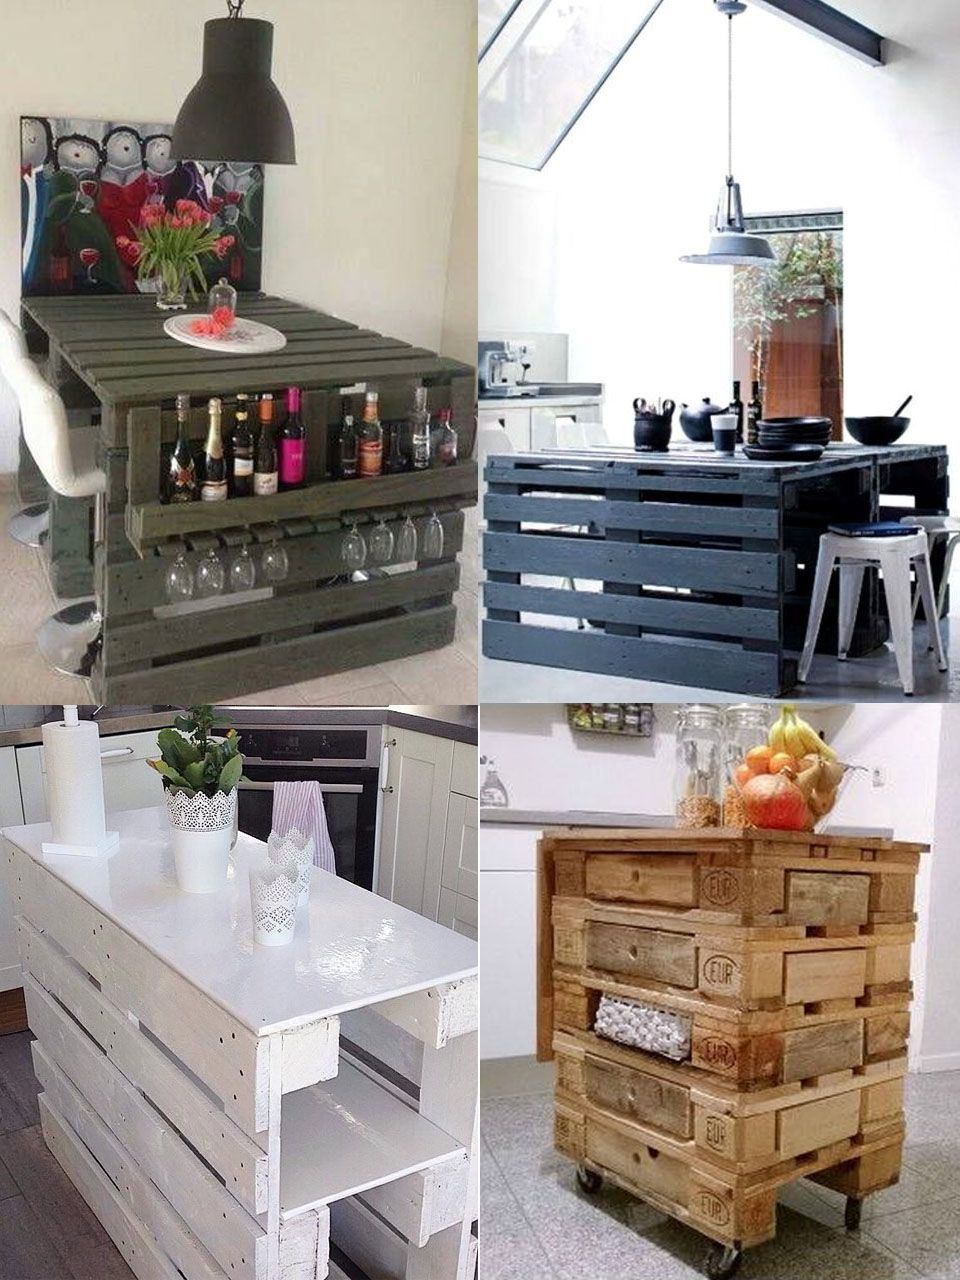 Cocina muebles con palets reciclados ideas de muebles pinterest pallets driftwood and - Muebles palets reciclados ...